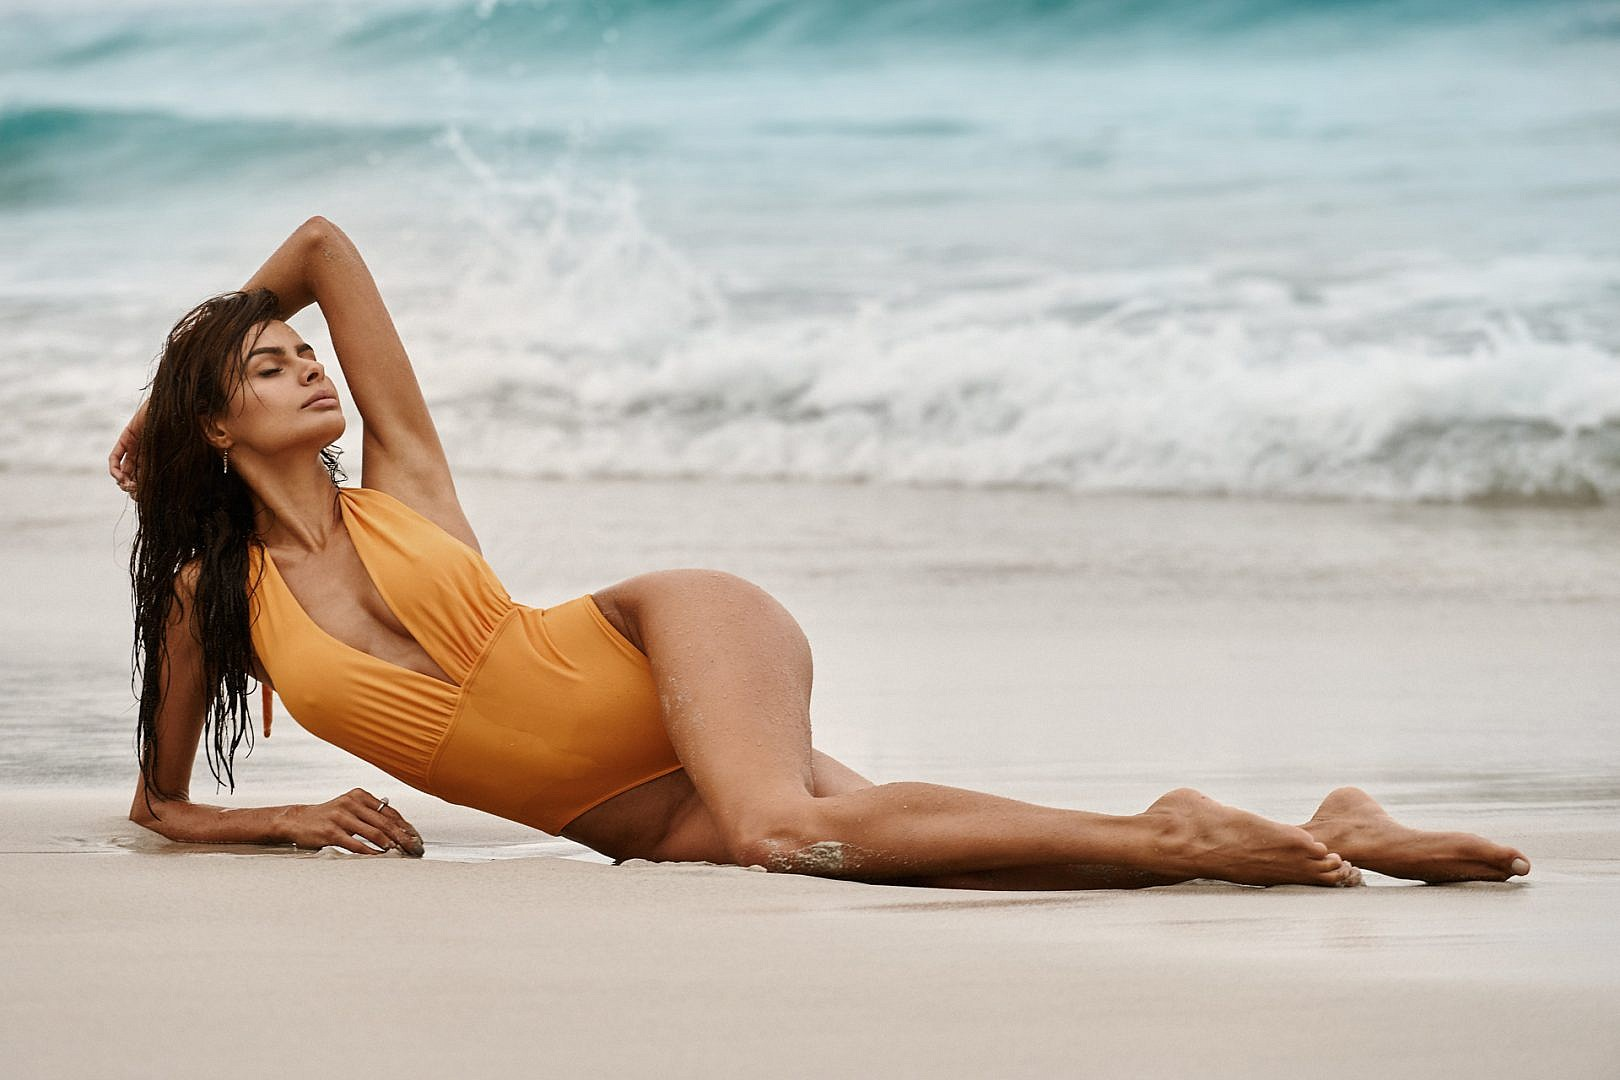 German swimwear photographer